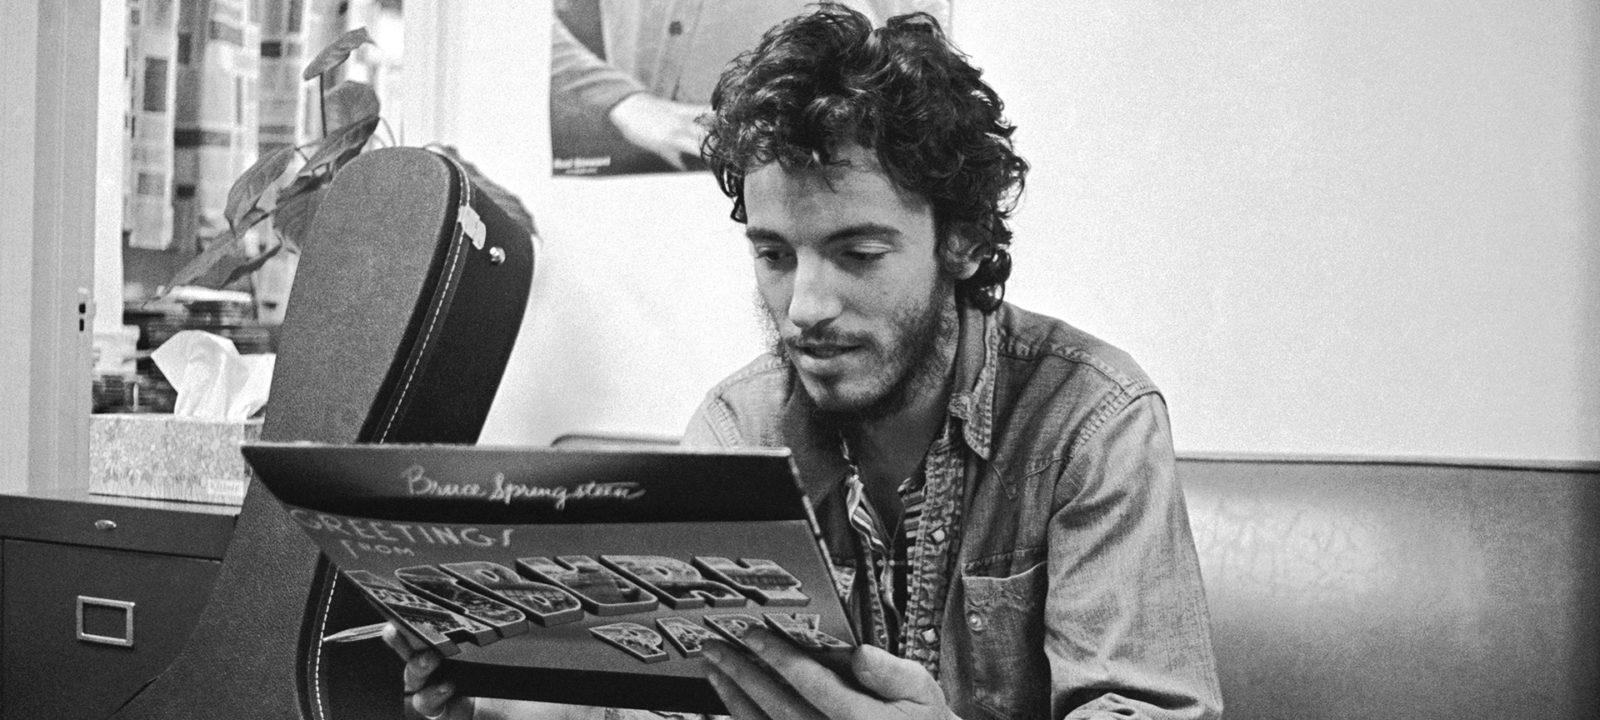 Springsteen_2